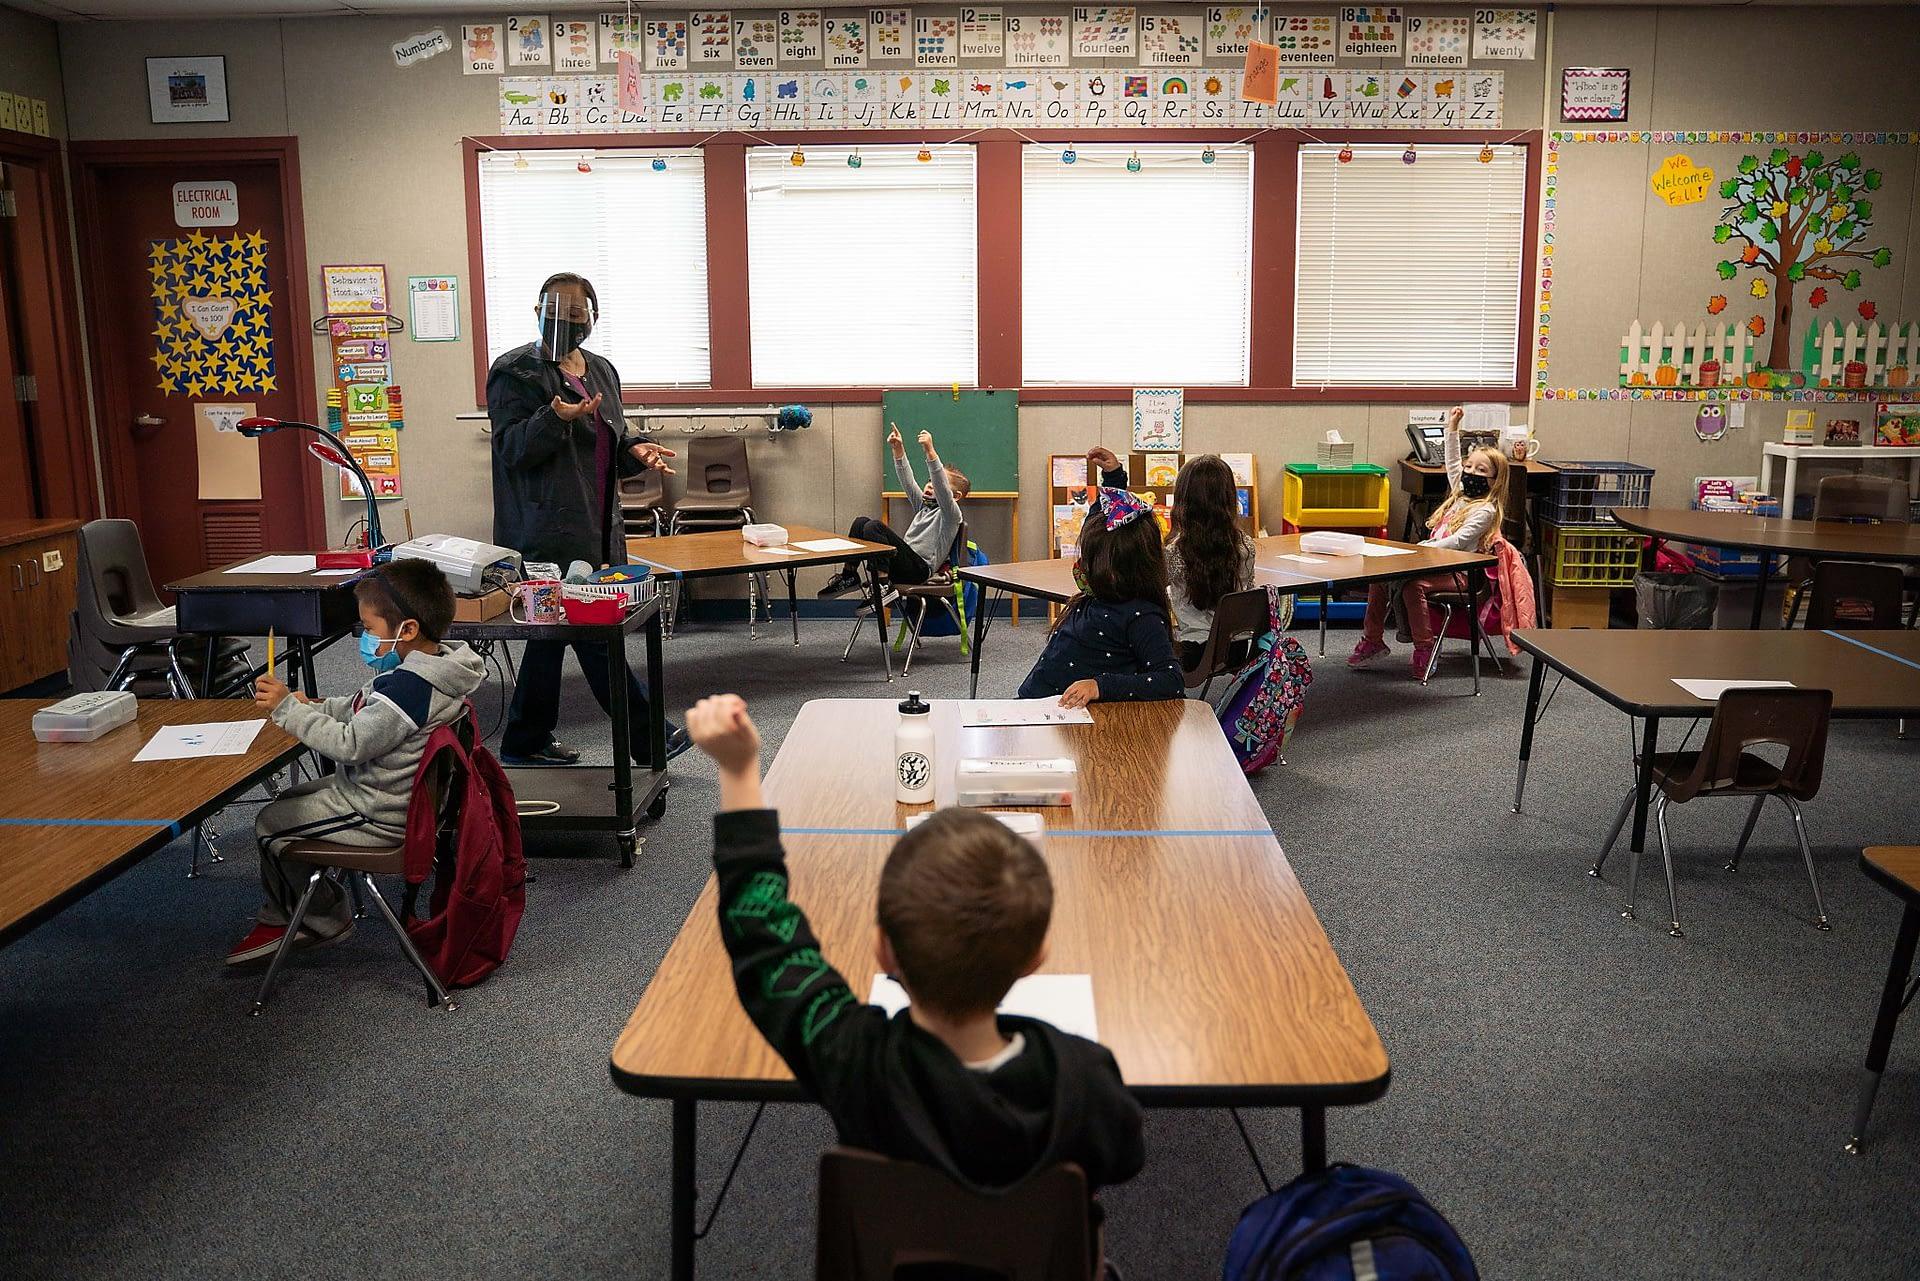 California public schools must have menstrual products